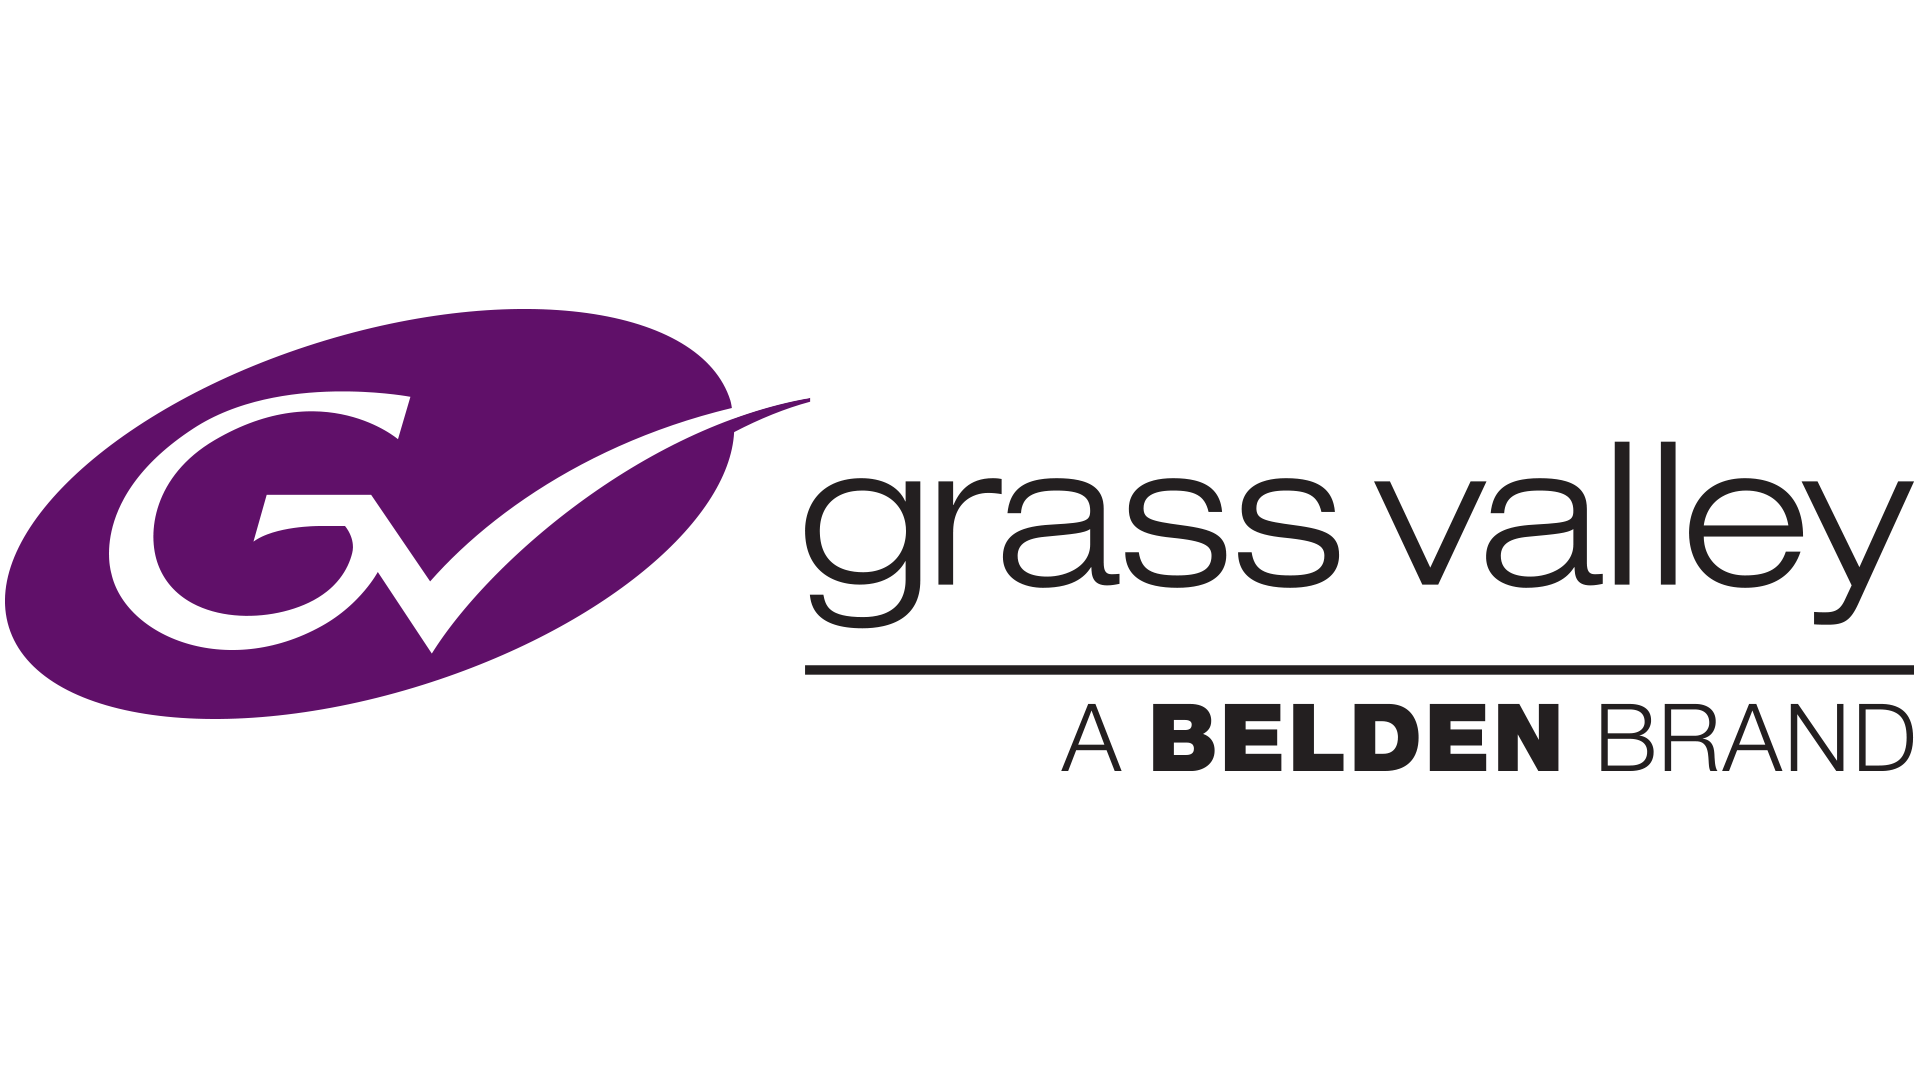 GrassValley_Logo_RGB.transparent.1920x1080.png